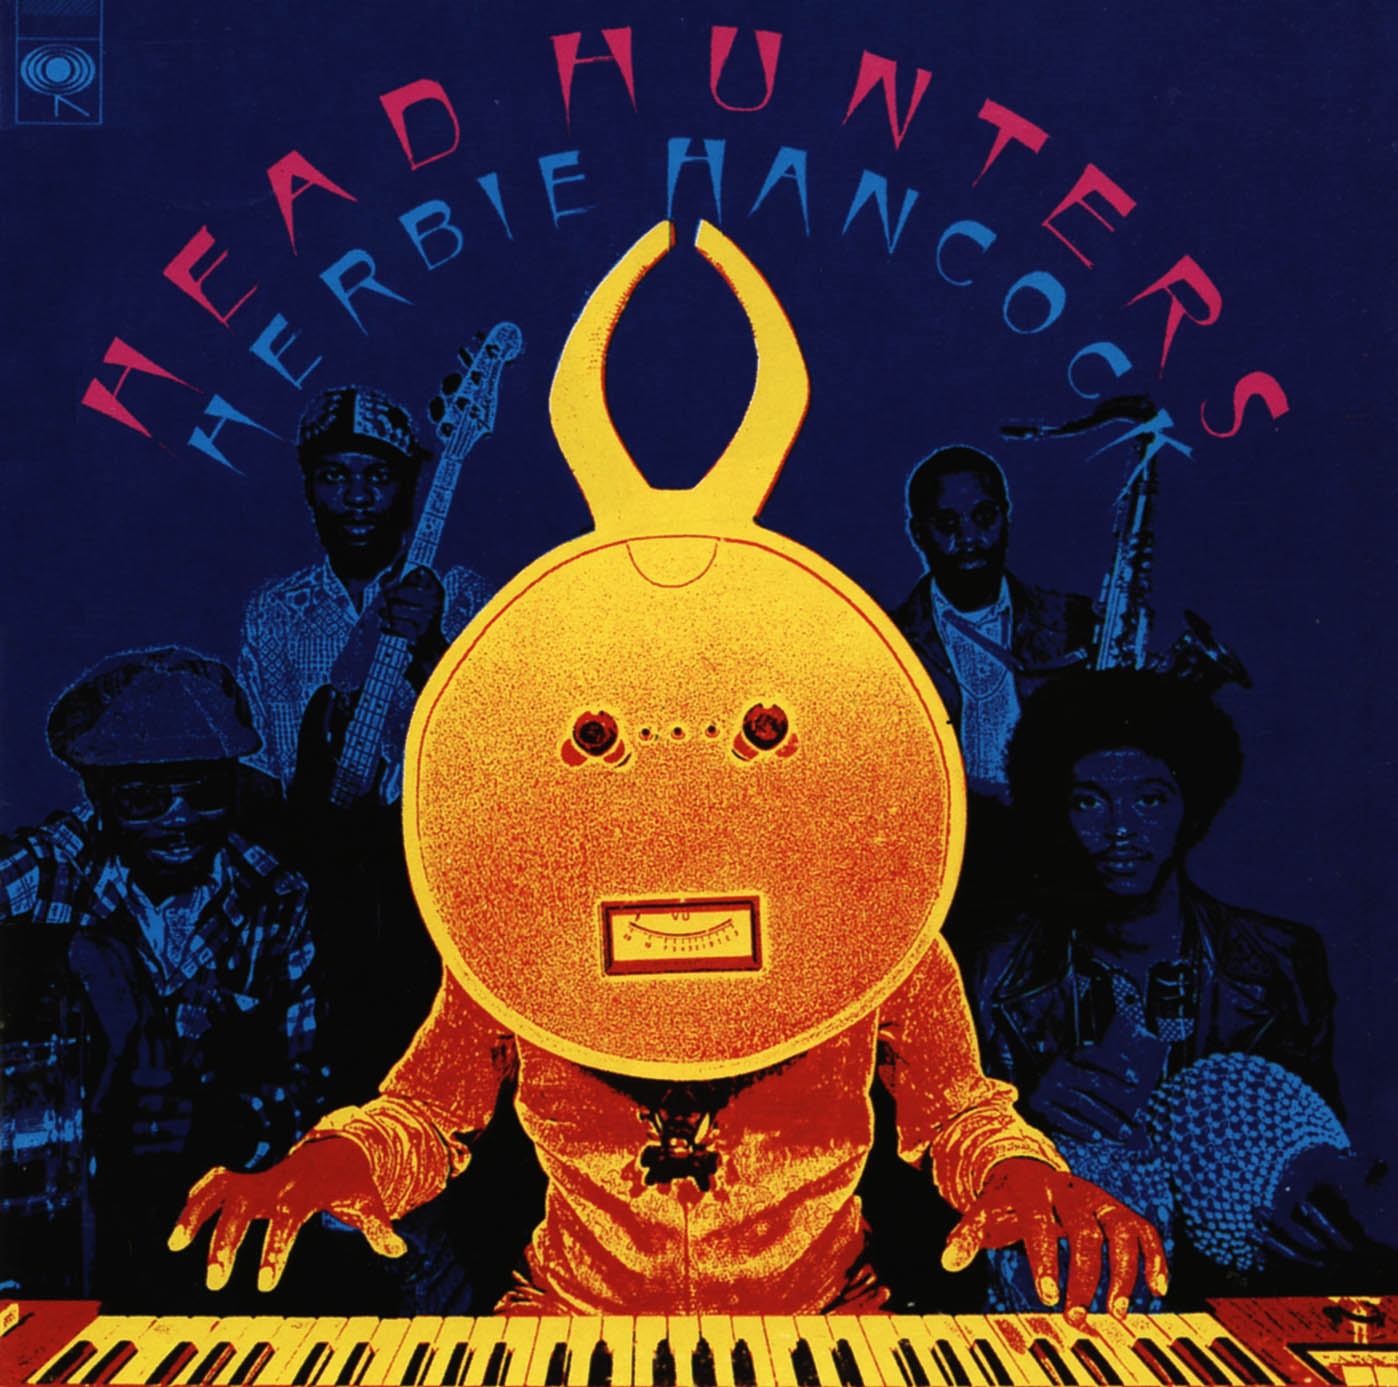 Headhunter Album Cover